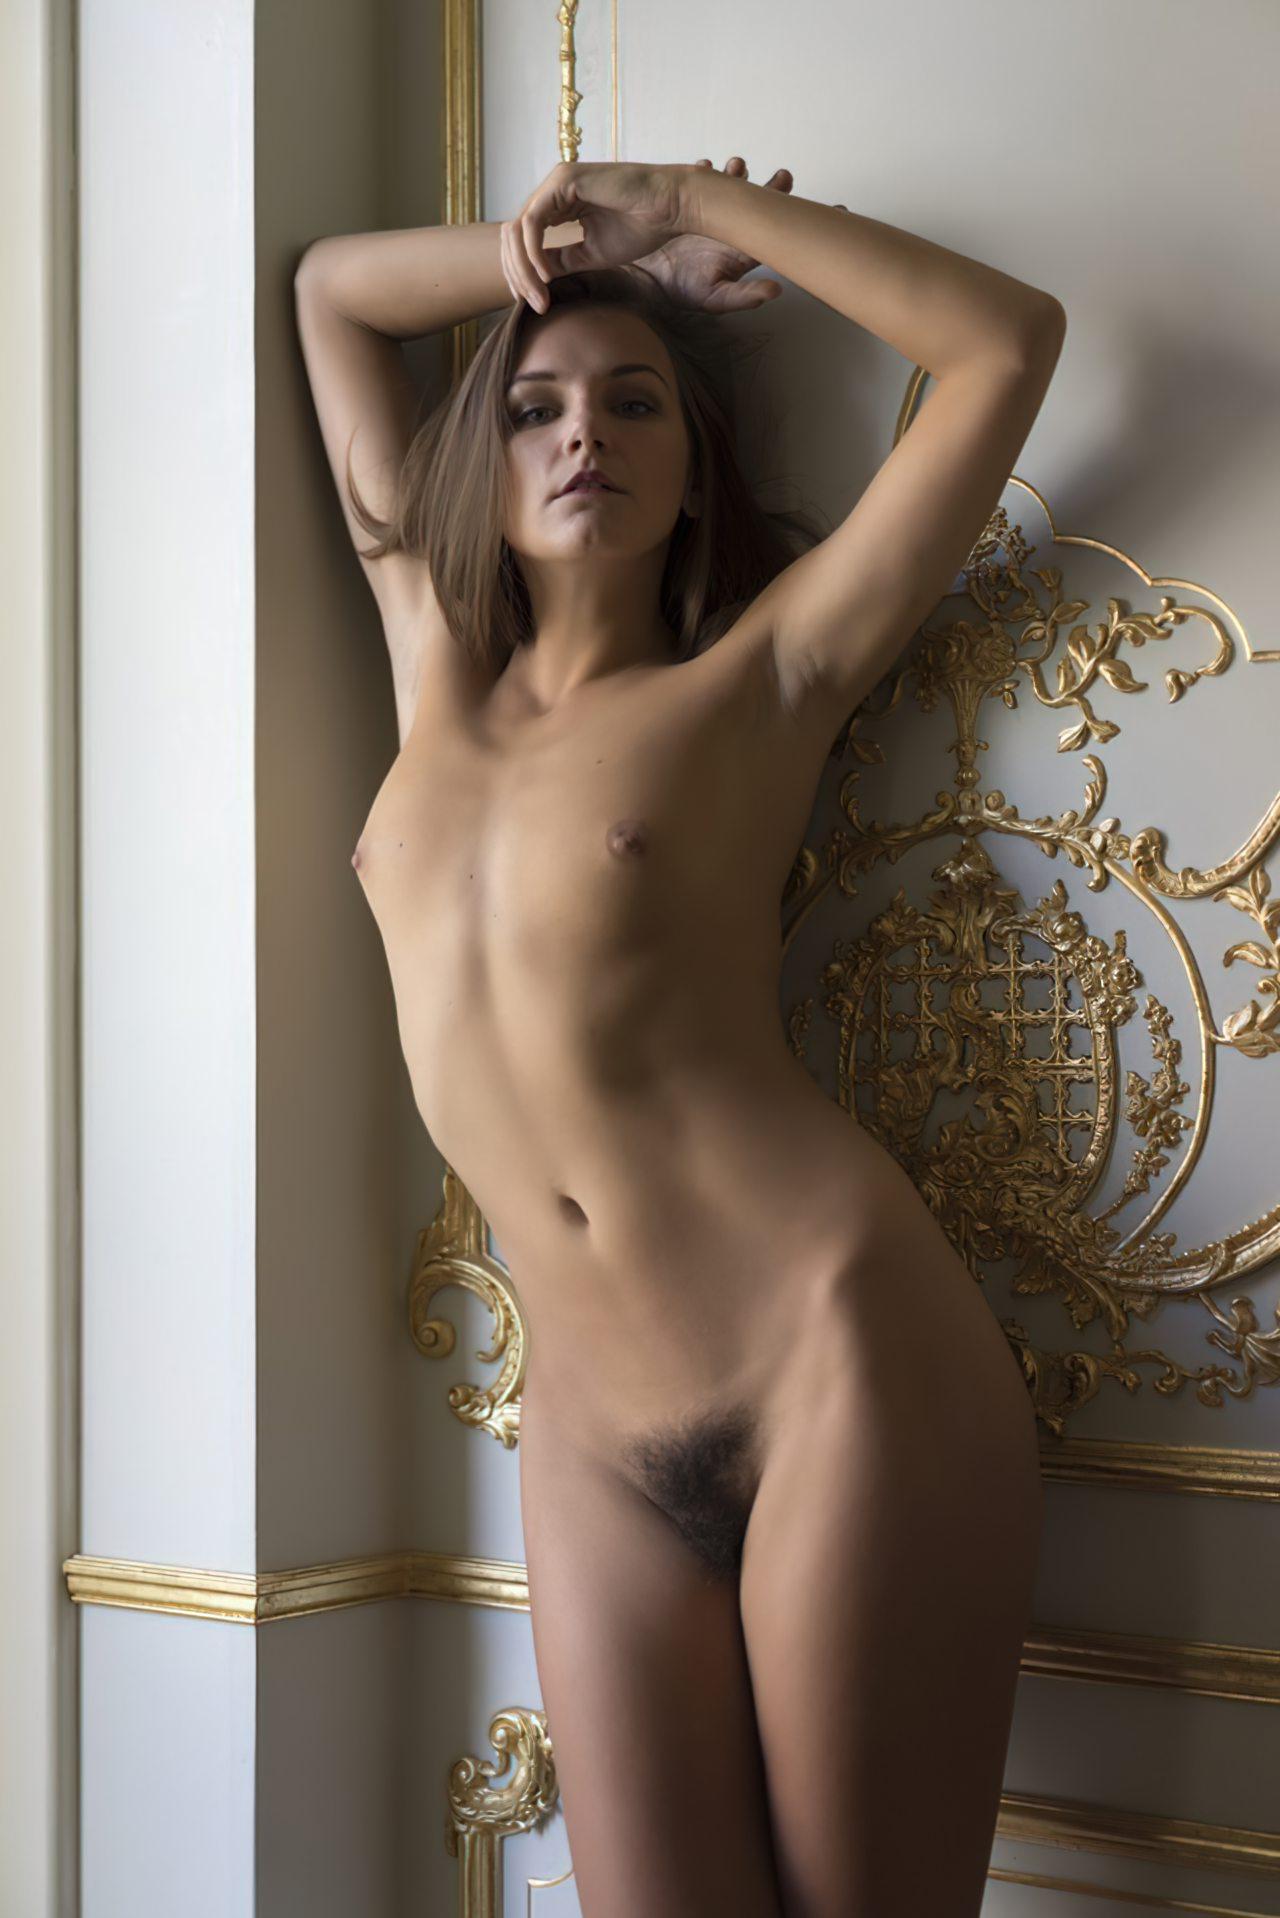 Mulheres Despidas (13)